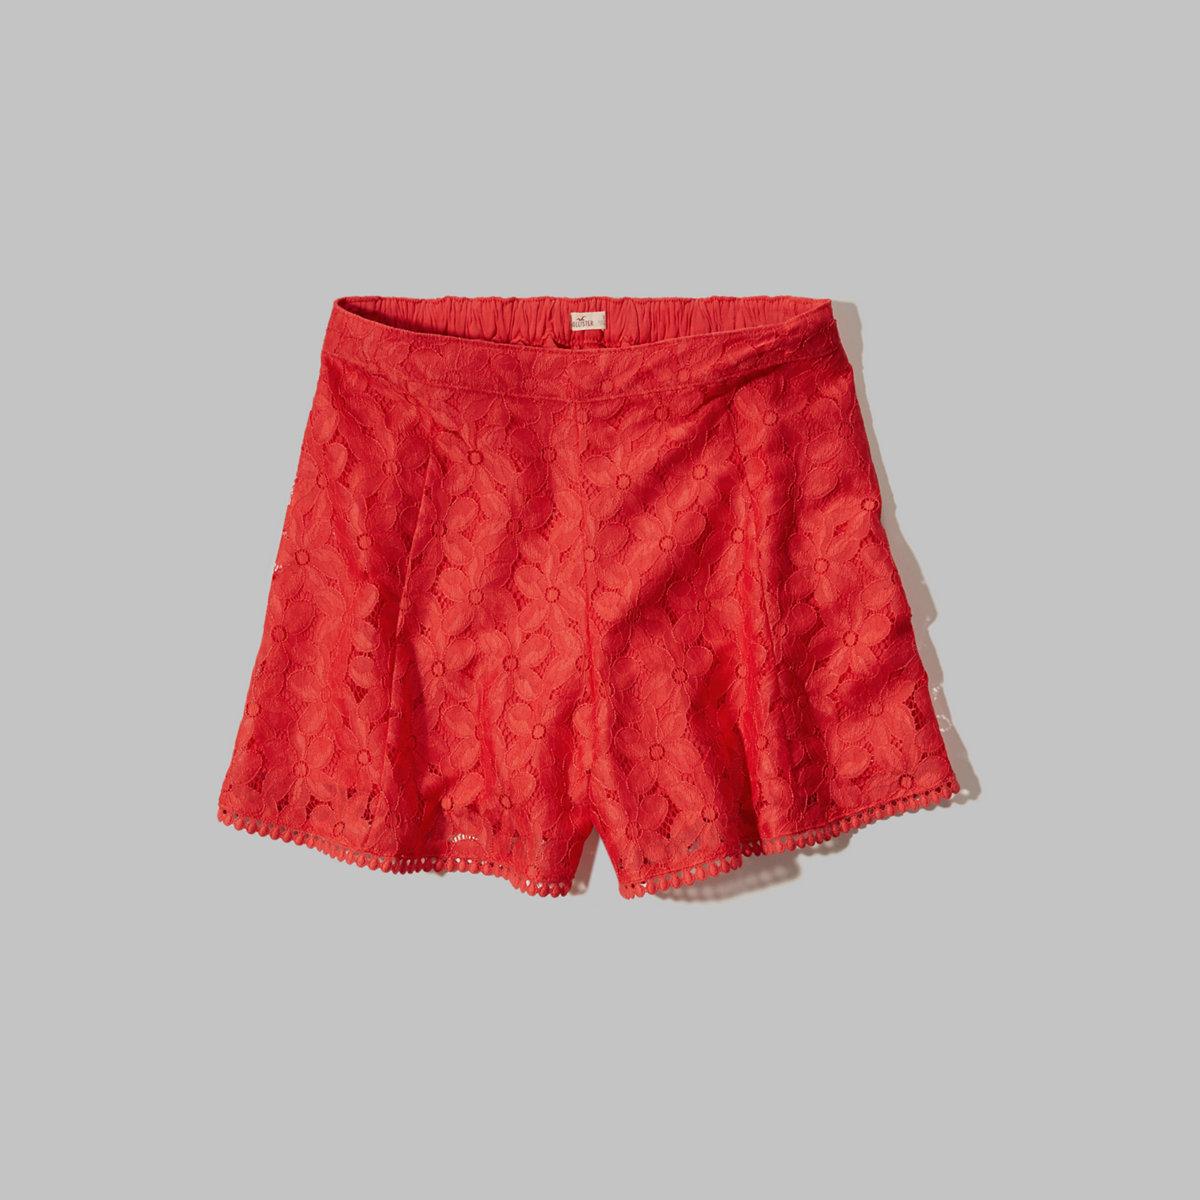 Lace High Waist Culotte Shorts